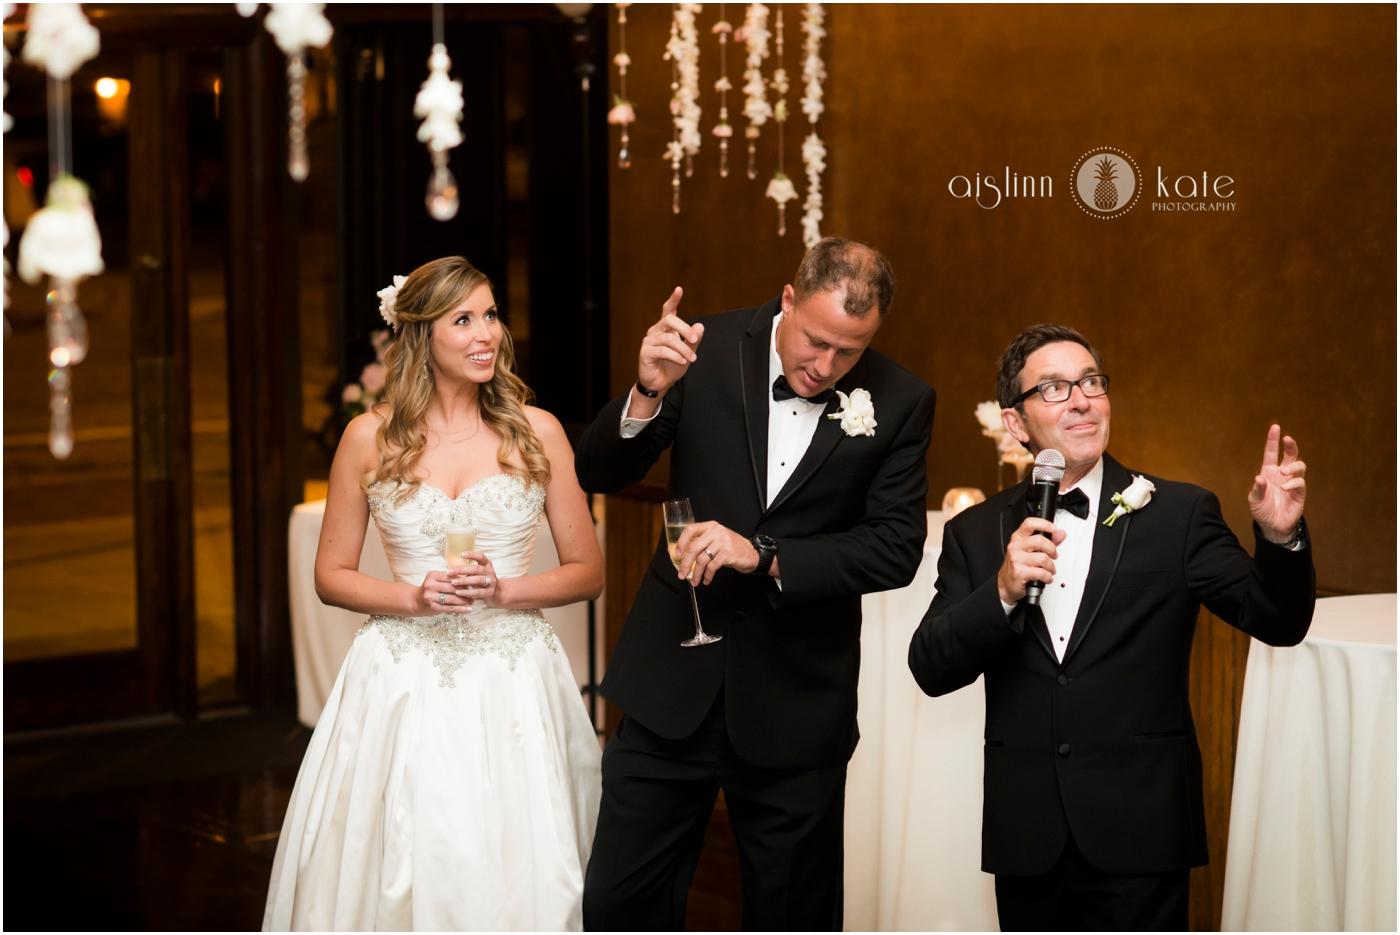 Pensacola-Destin-Wedding-Photographer_5559.jpg